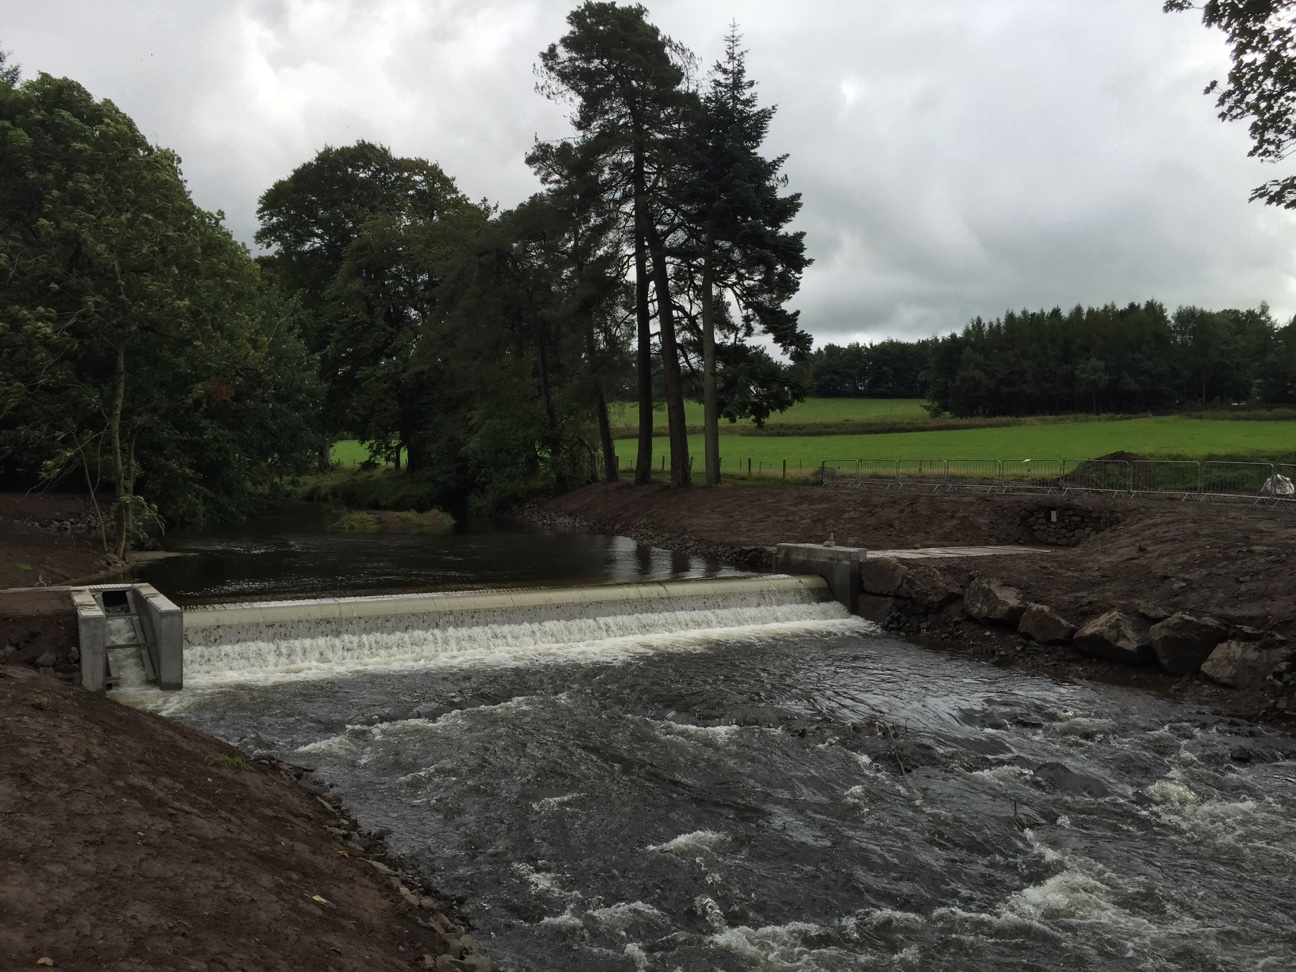 Hydro scheme funding helps Fossoway Gathering return after